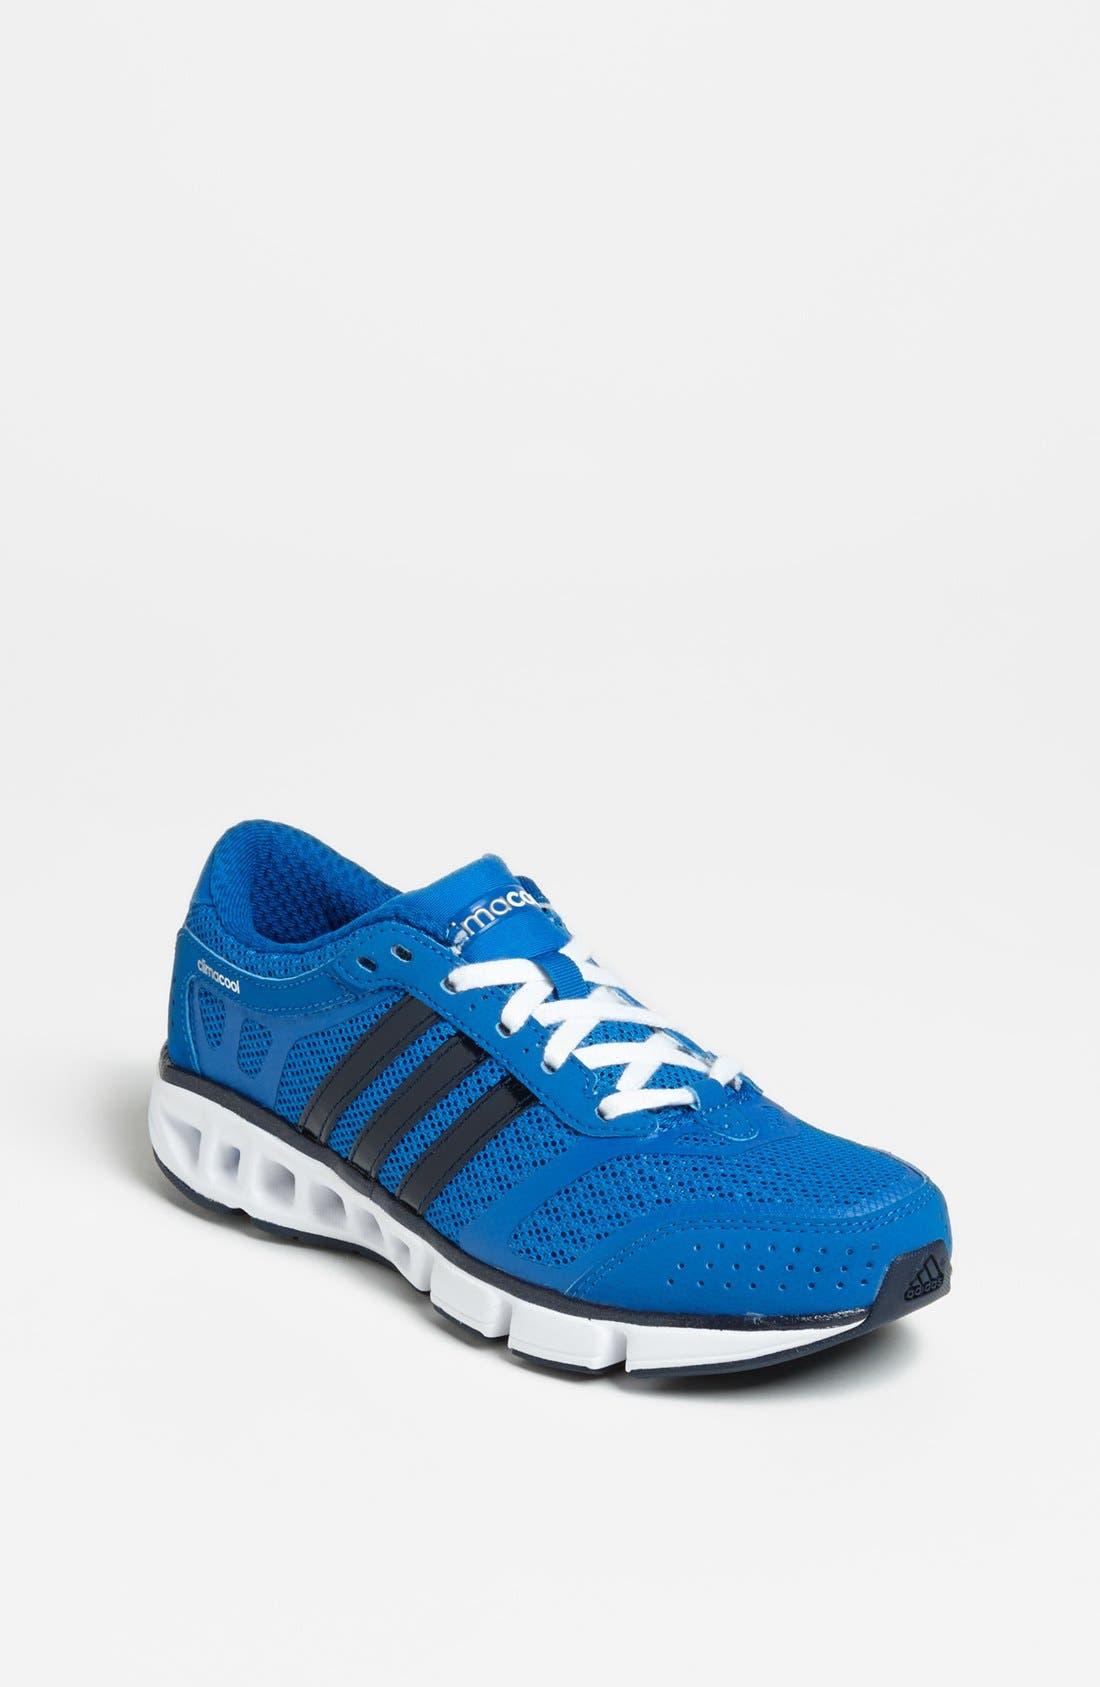 Alternate Image 1 Selected - adidas 'CC Ride' Running Shoe (Big Kid)